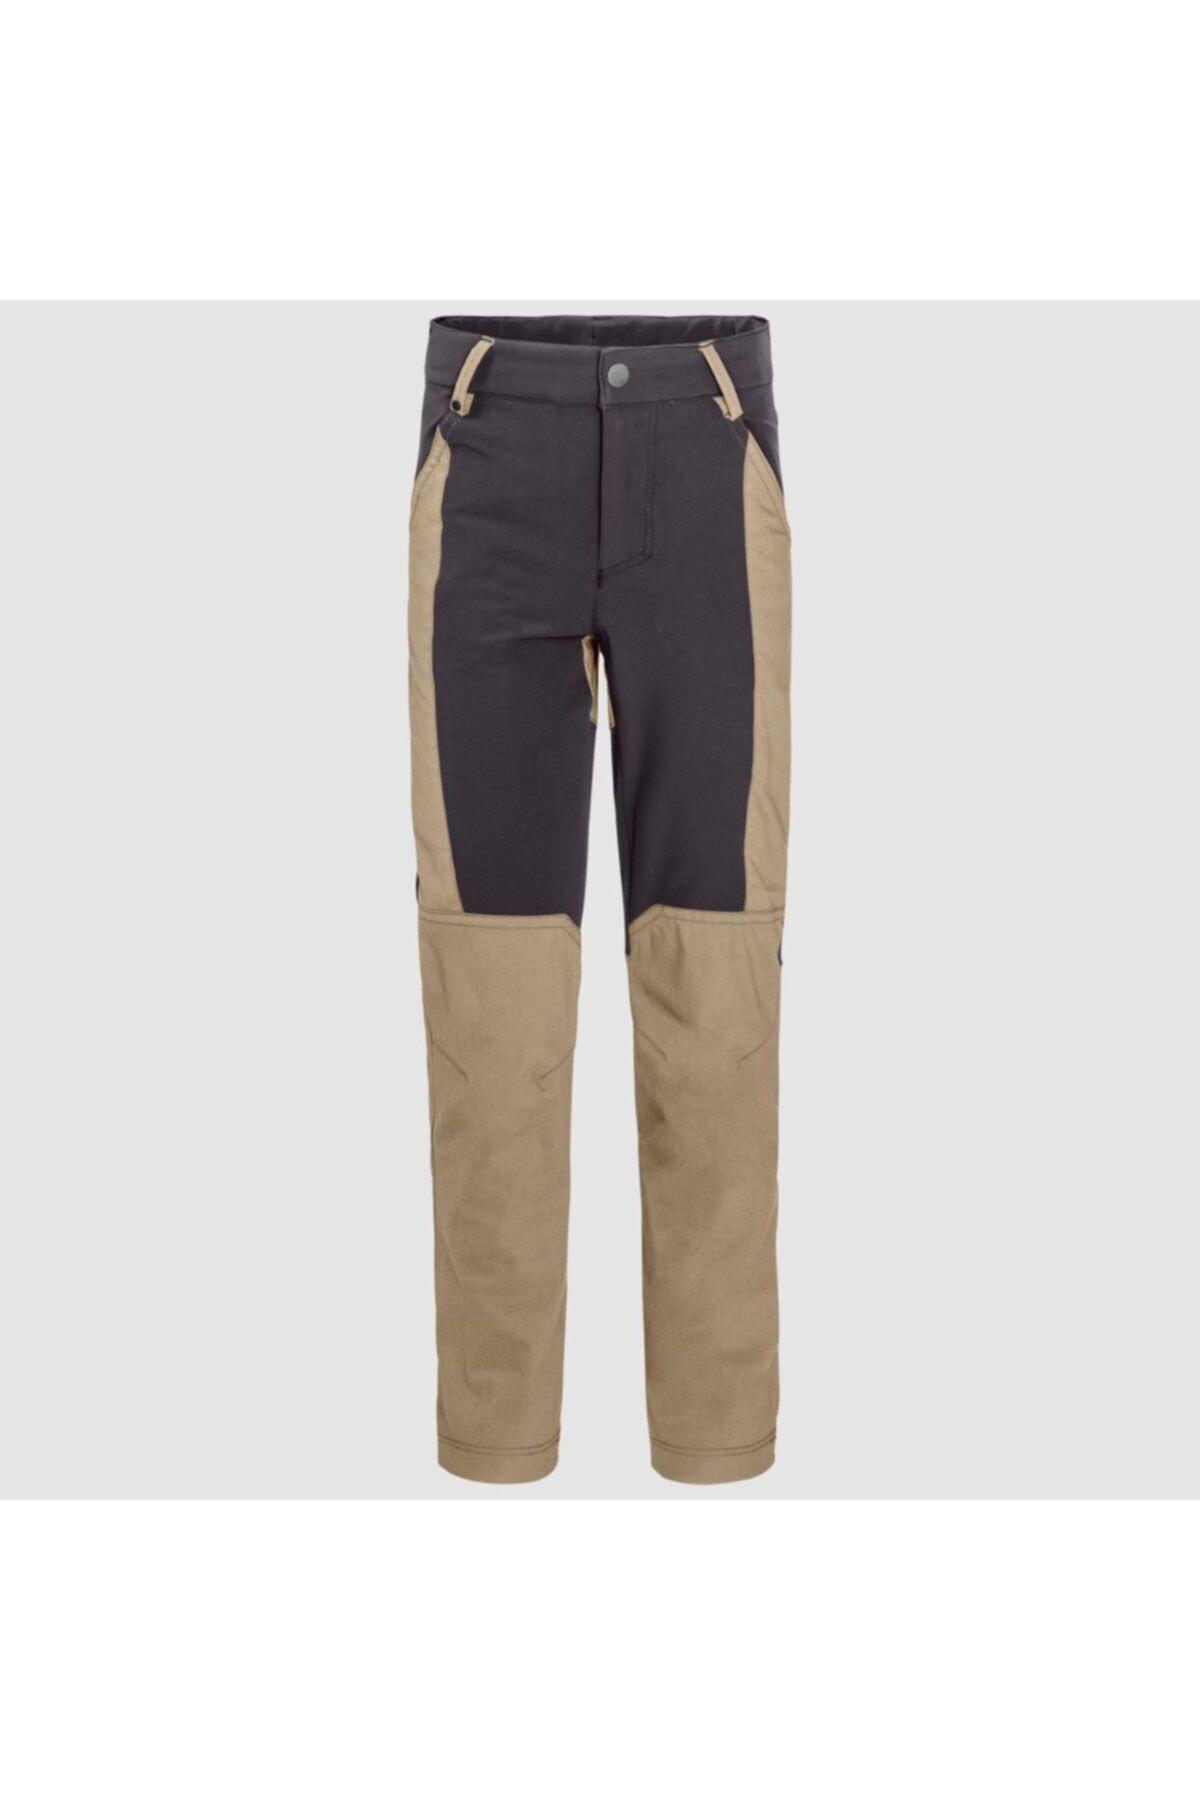 Jack Wolfskin Dillon Flex Çocuk Pantolon 1